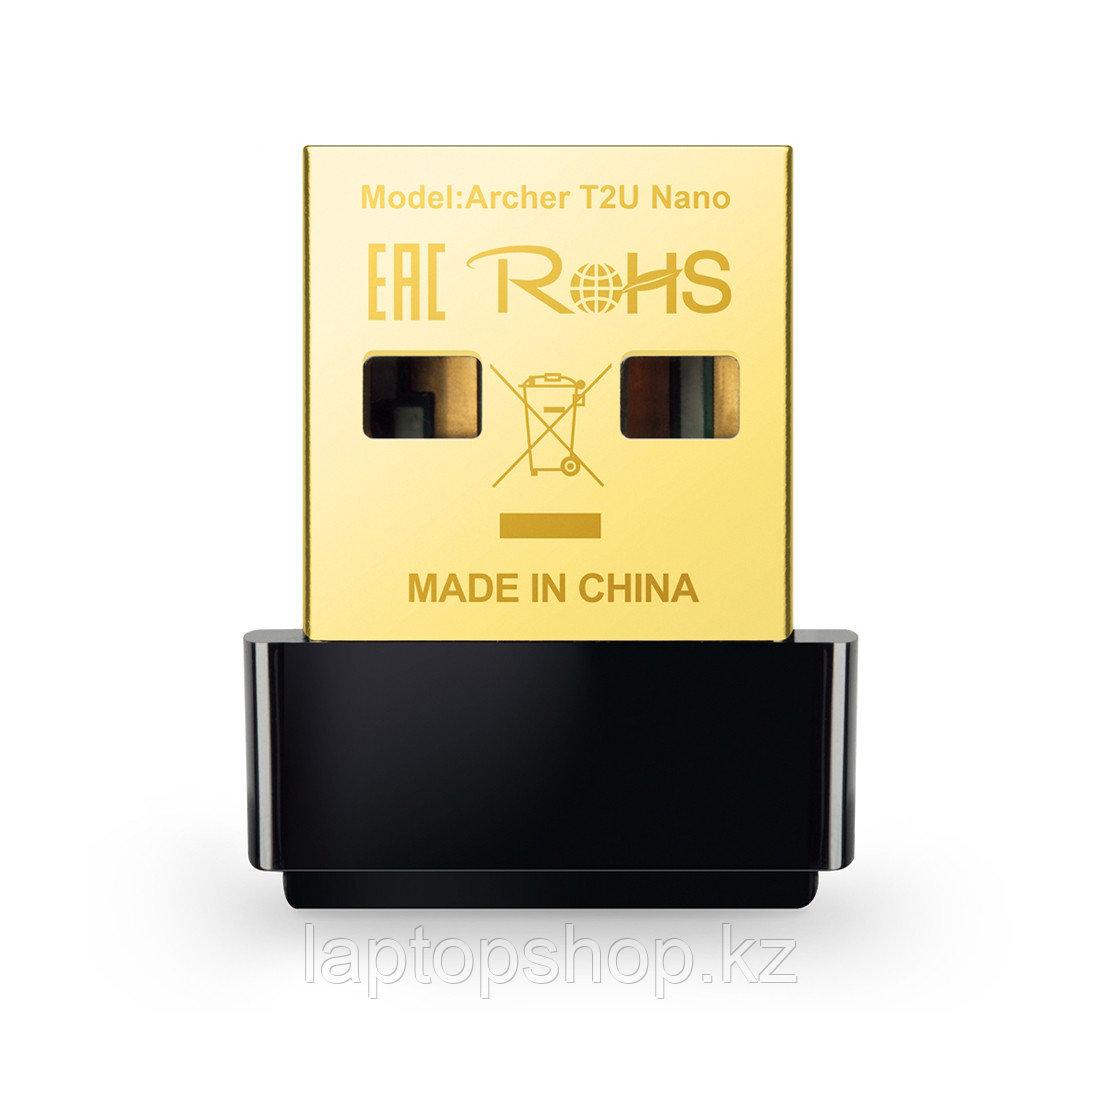 USB-адаптер TP-Link Archer T2U Nano